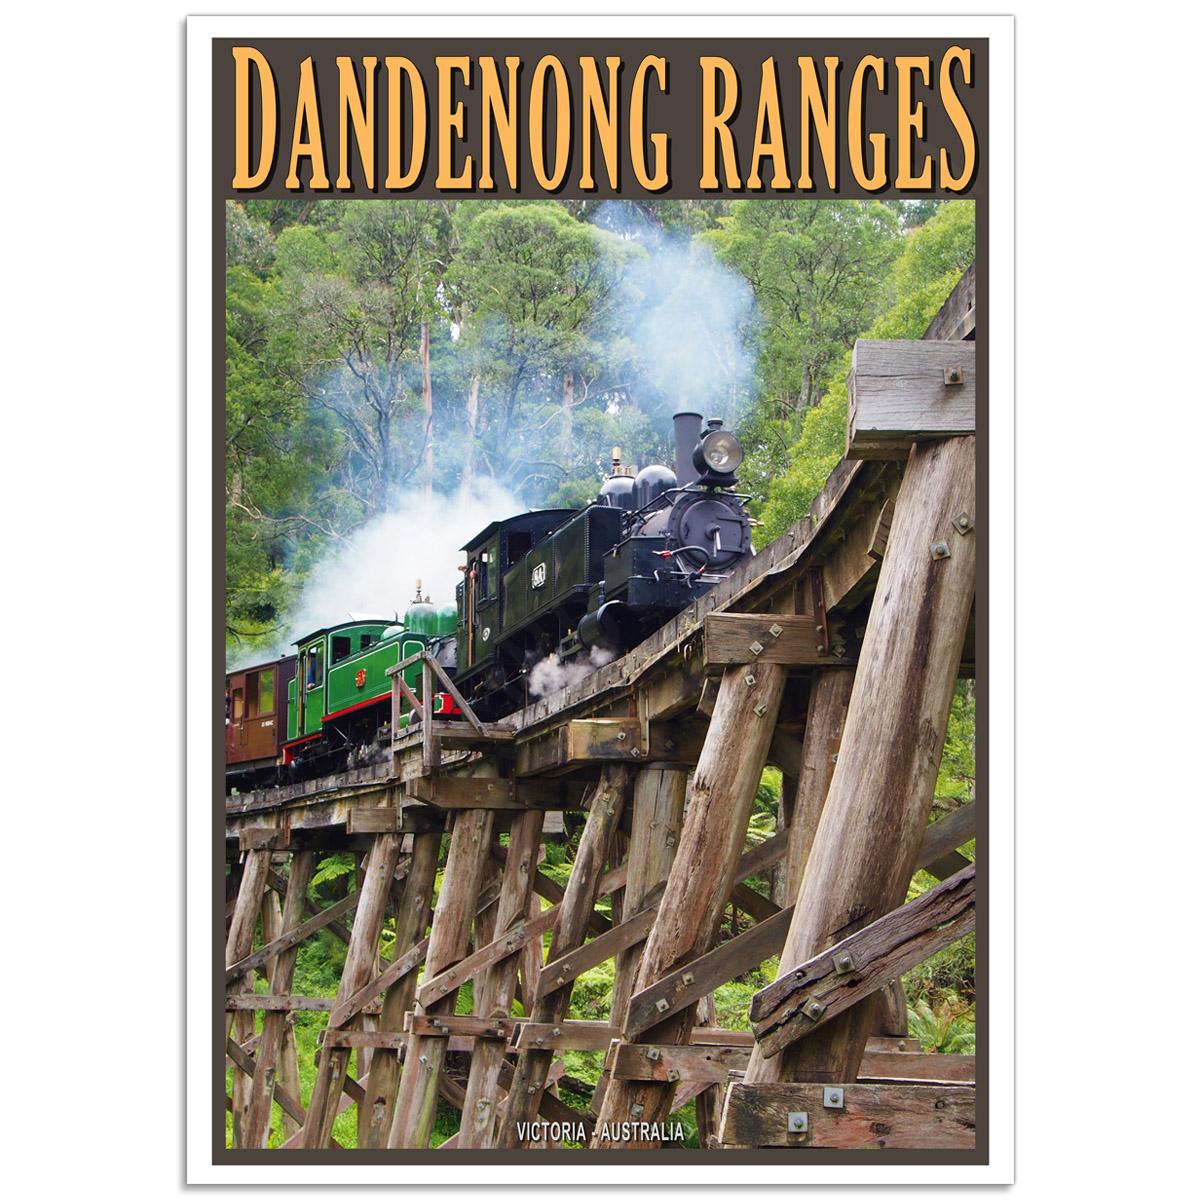 Australian Photographic Poster - Dandenong Ranges - Victoria